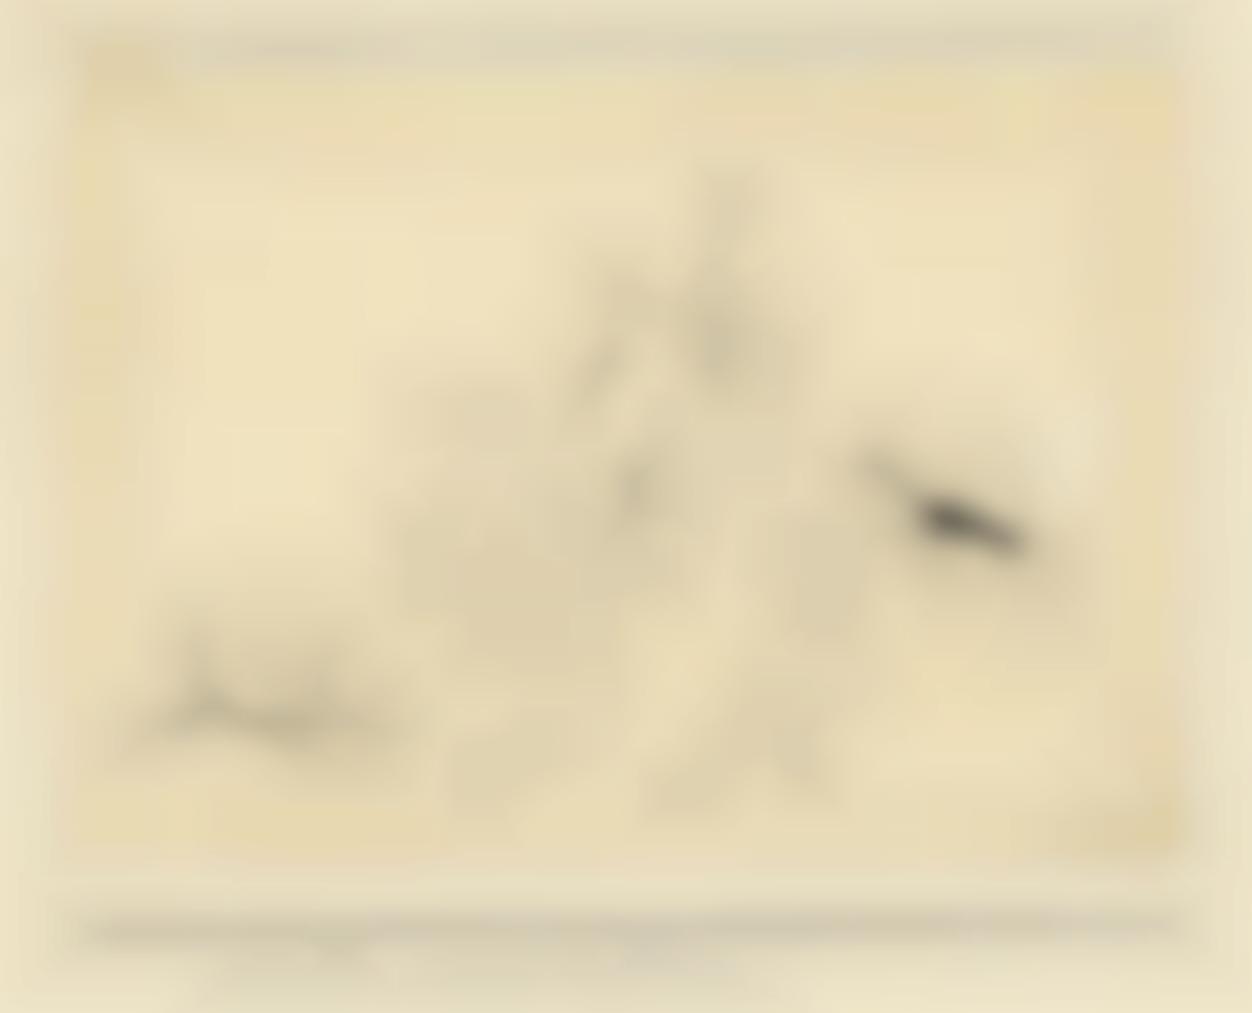 Paul Klee-Angreifende Pflanzen (Attacking Plants)-1926